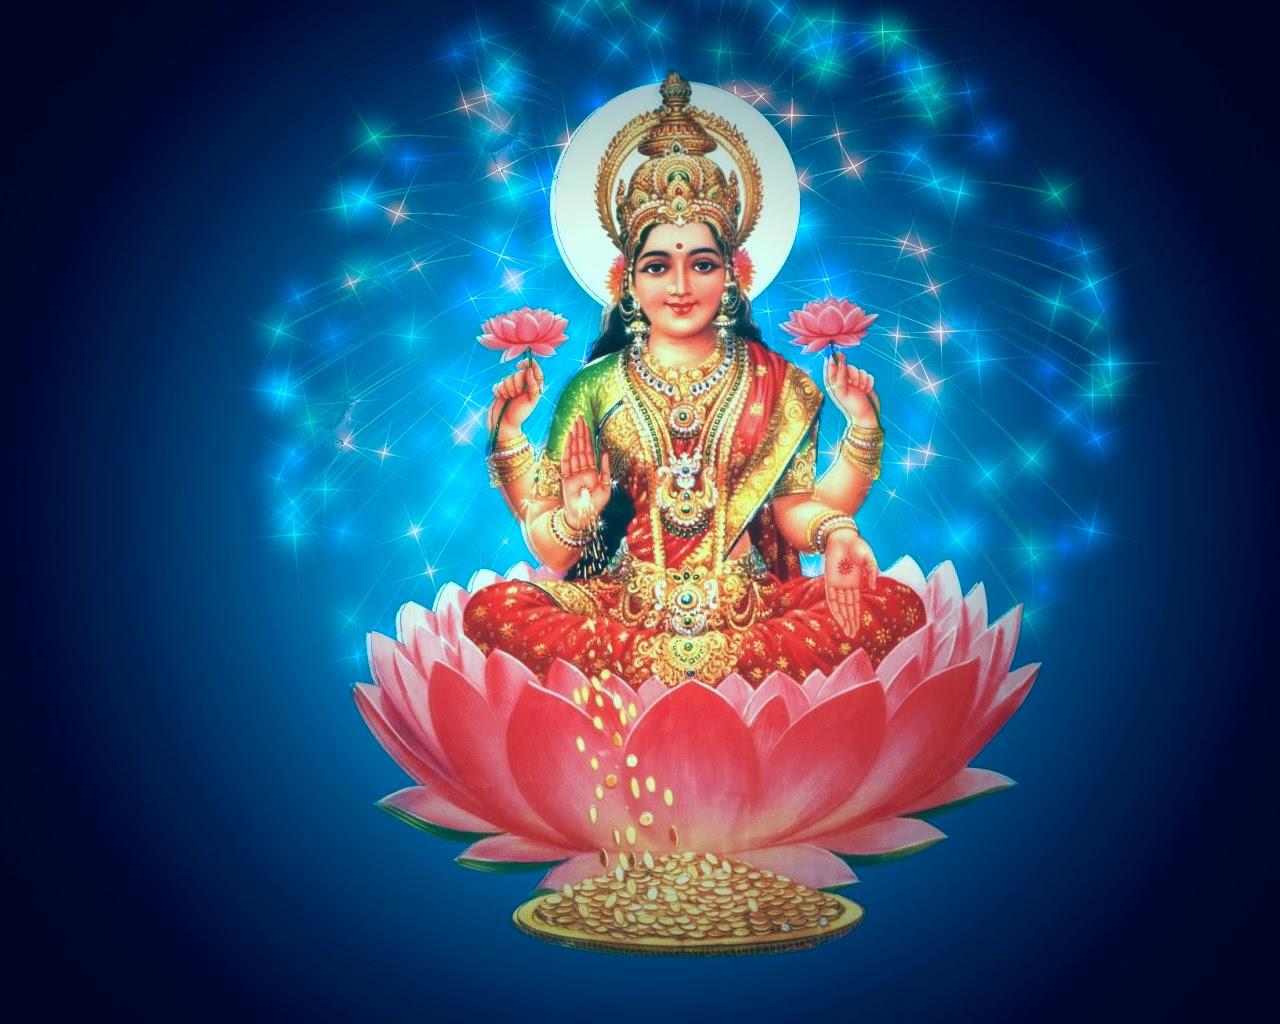 Happy dhanteras Laxmi Goddess Sitting On Lotus  HD Wallpaper 2014